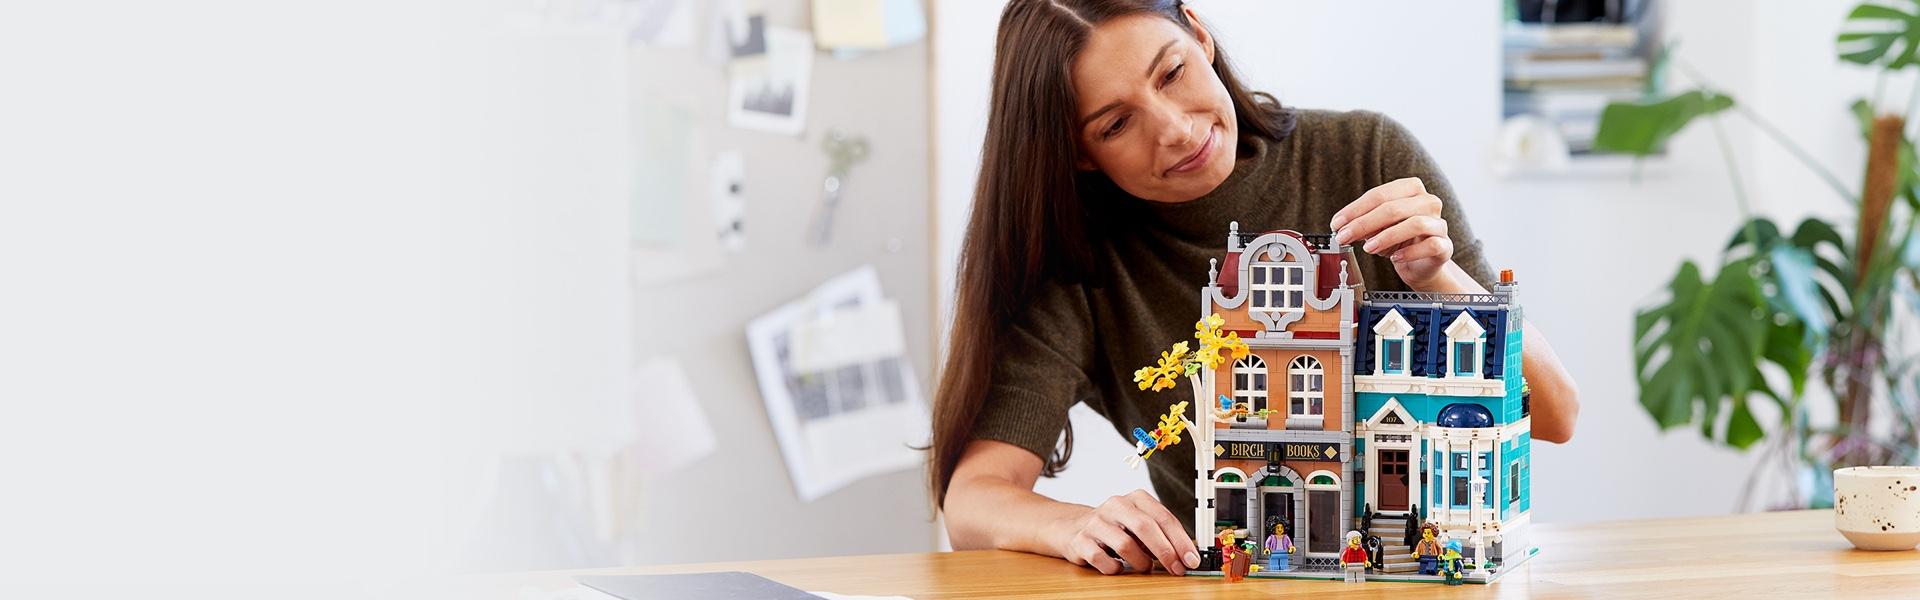 Split LEGO 10270 Birch Bookstore ONLY Read Description FREE SHIPPING Jan 2020